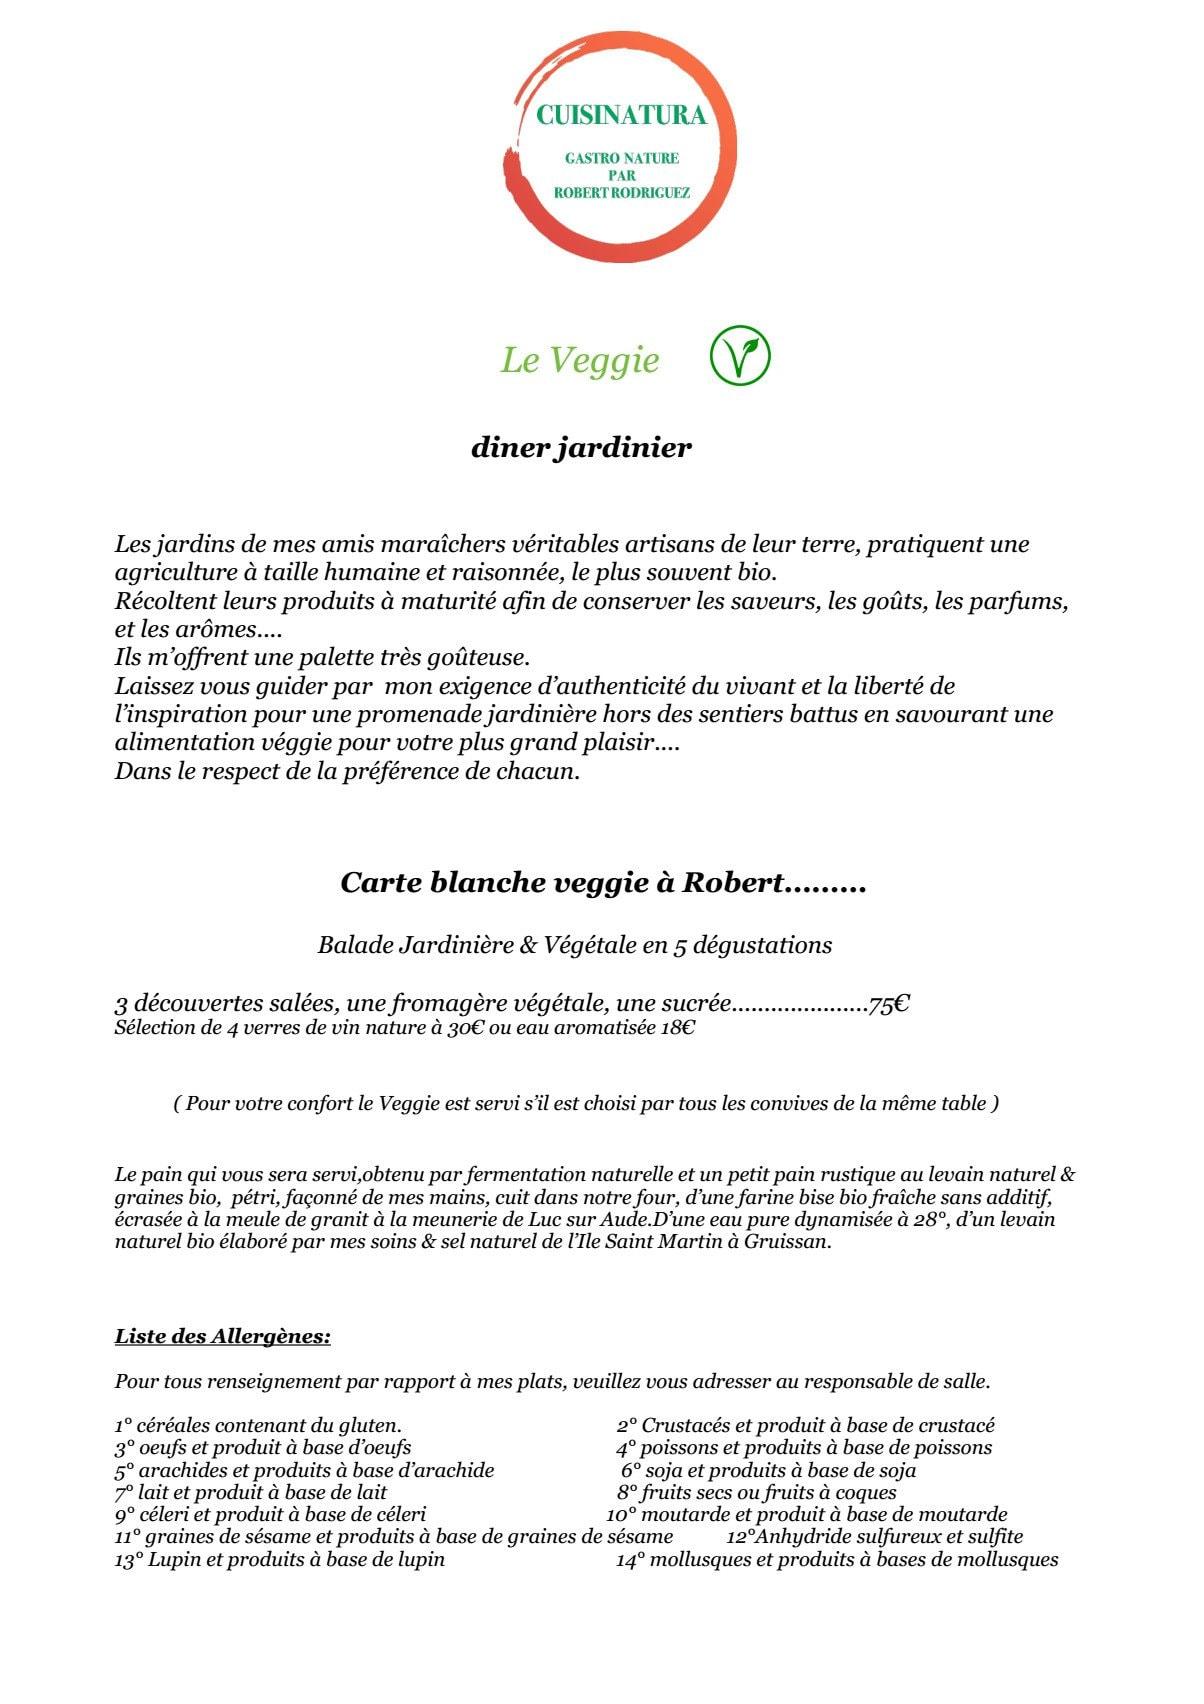 cantine de robert carcassonne carte menu et photos. Black Bedroom Furniture Sets. Home Design Ideas